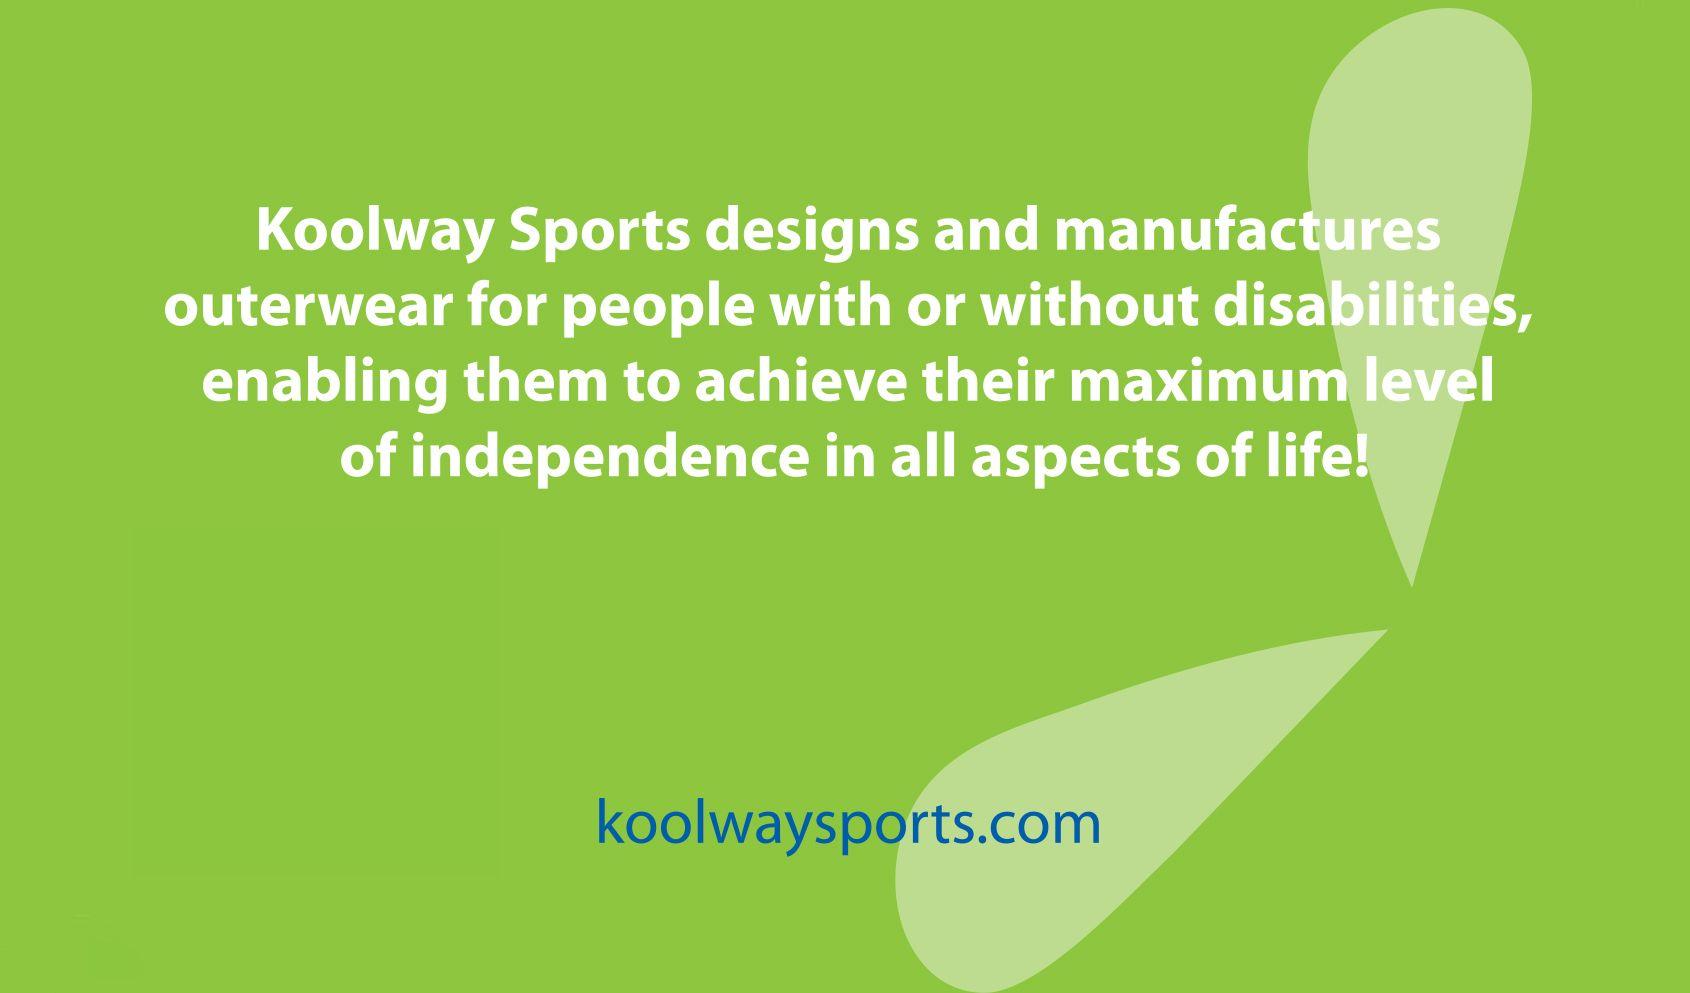 Koolway Sports See swimwear